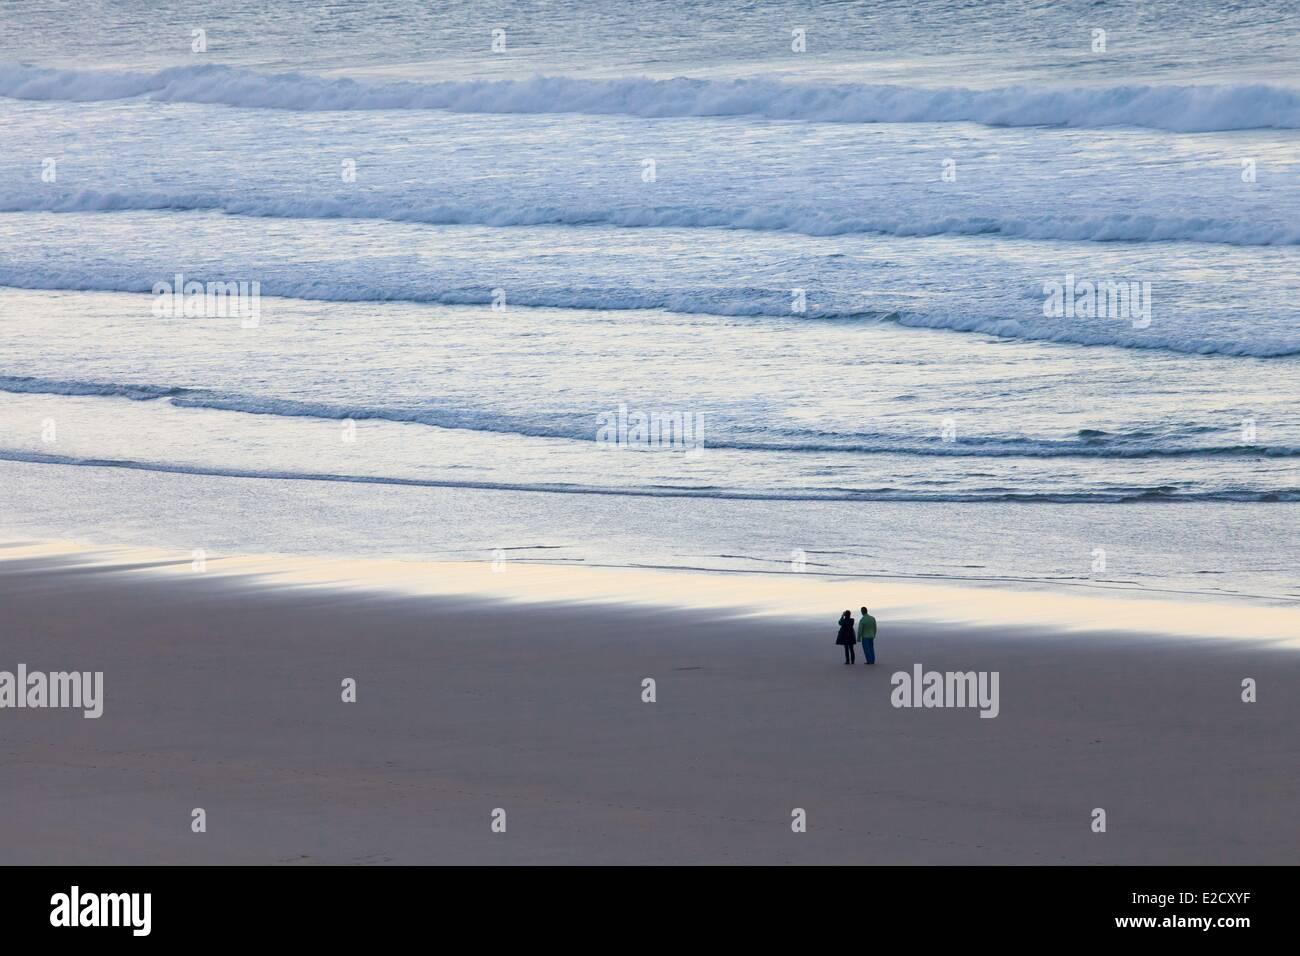 Spain Cantabria beach near San Vicente de la Barquera - Stock Image